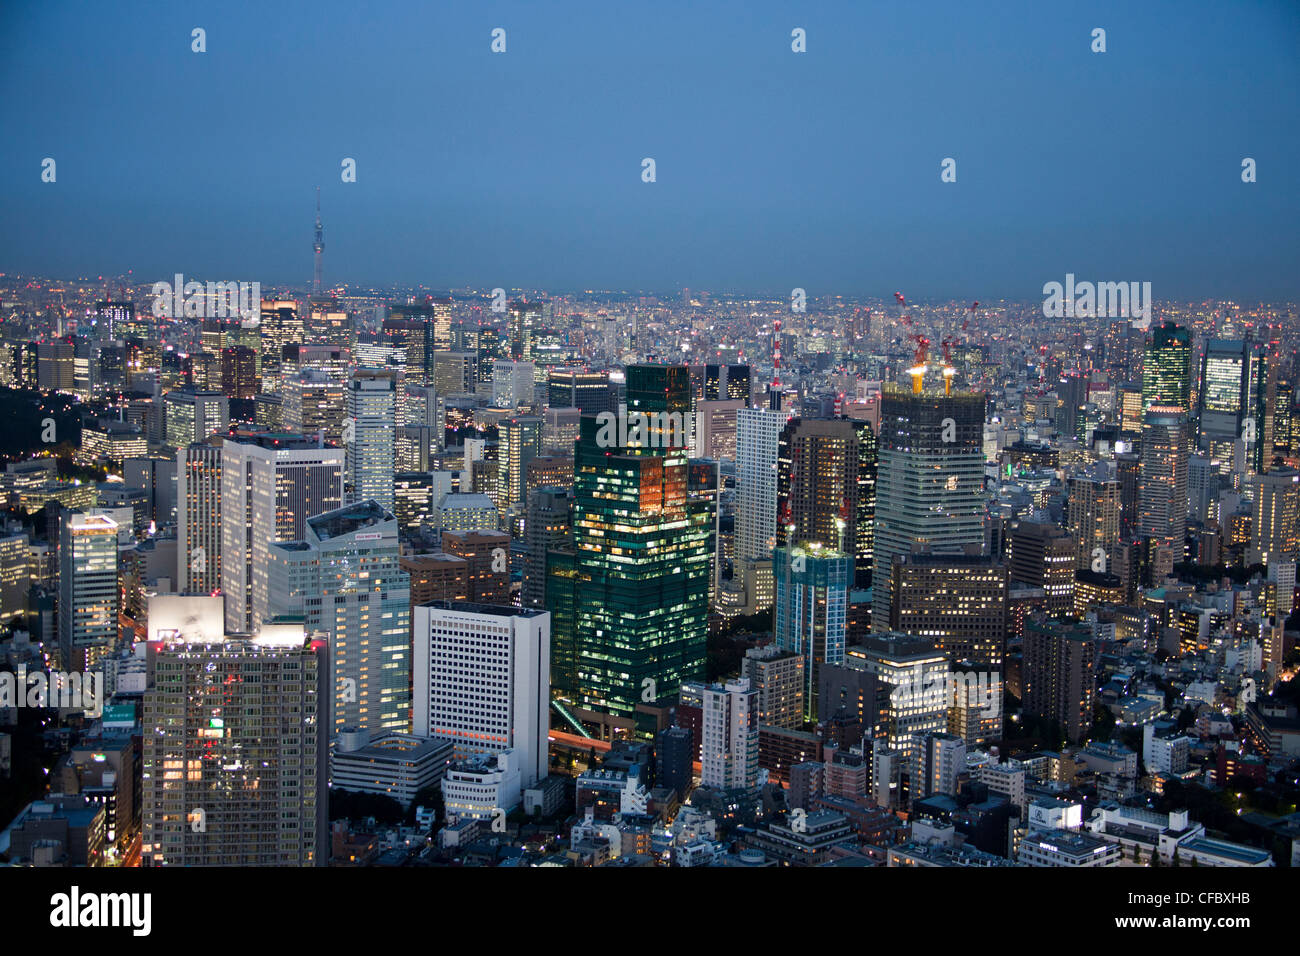 Central asia stockfotos central asia bilder alamy - Architektur tokyo ...